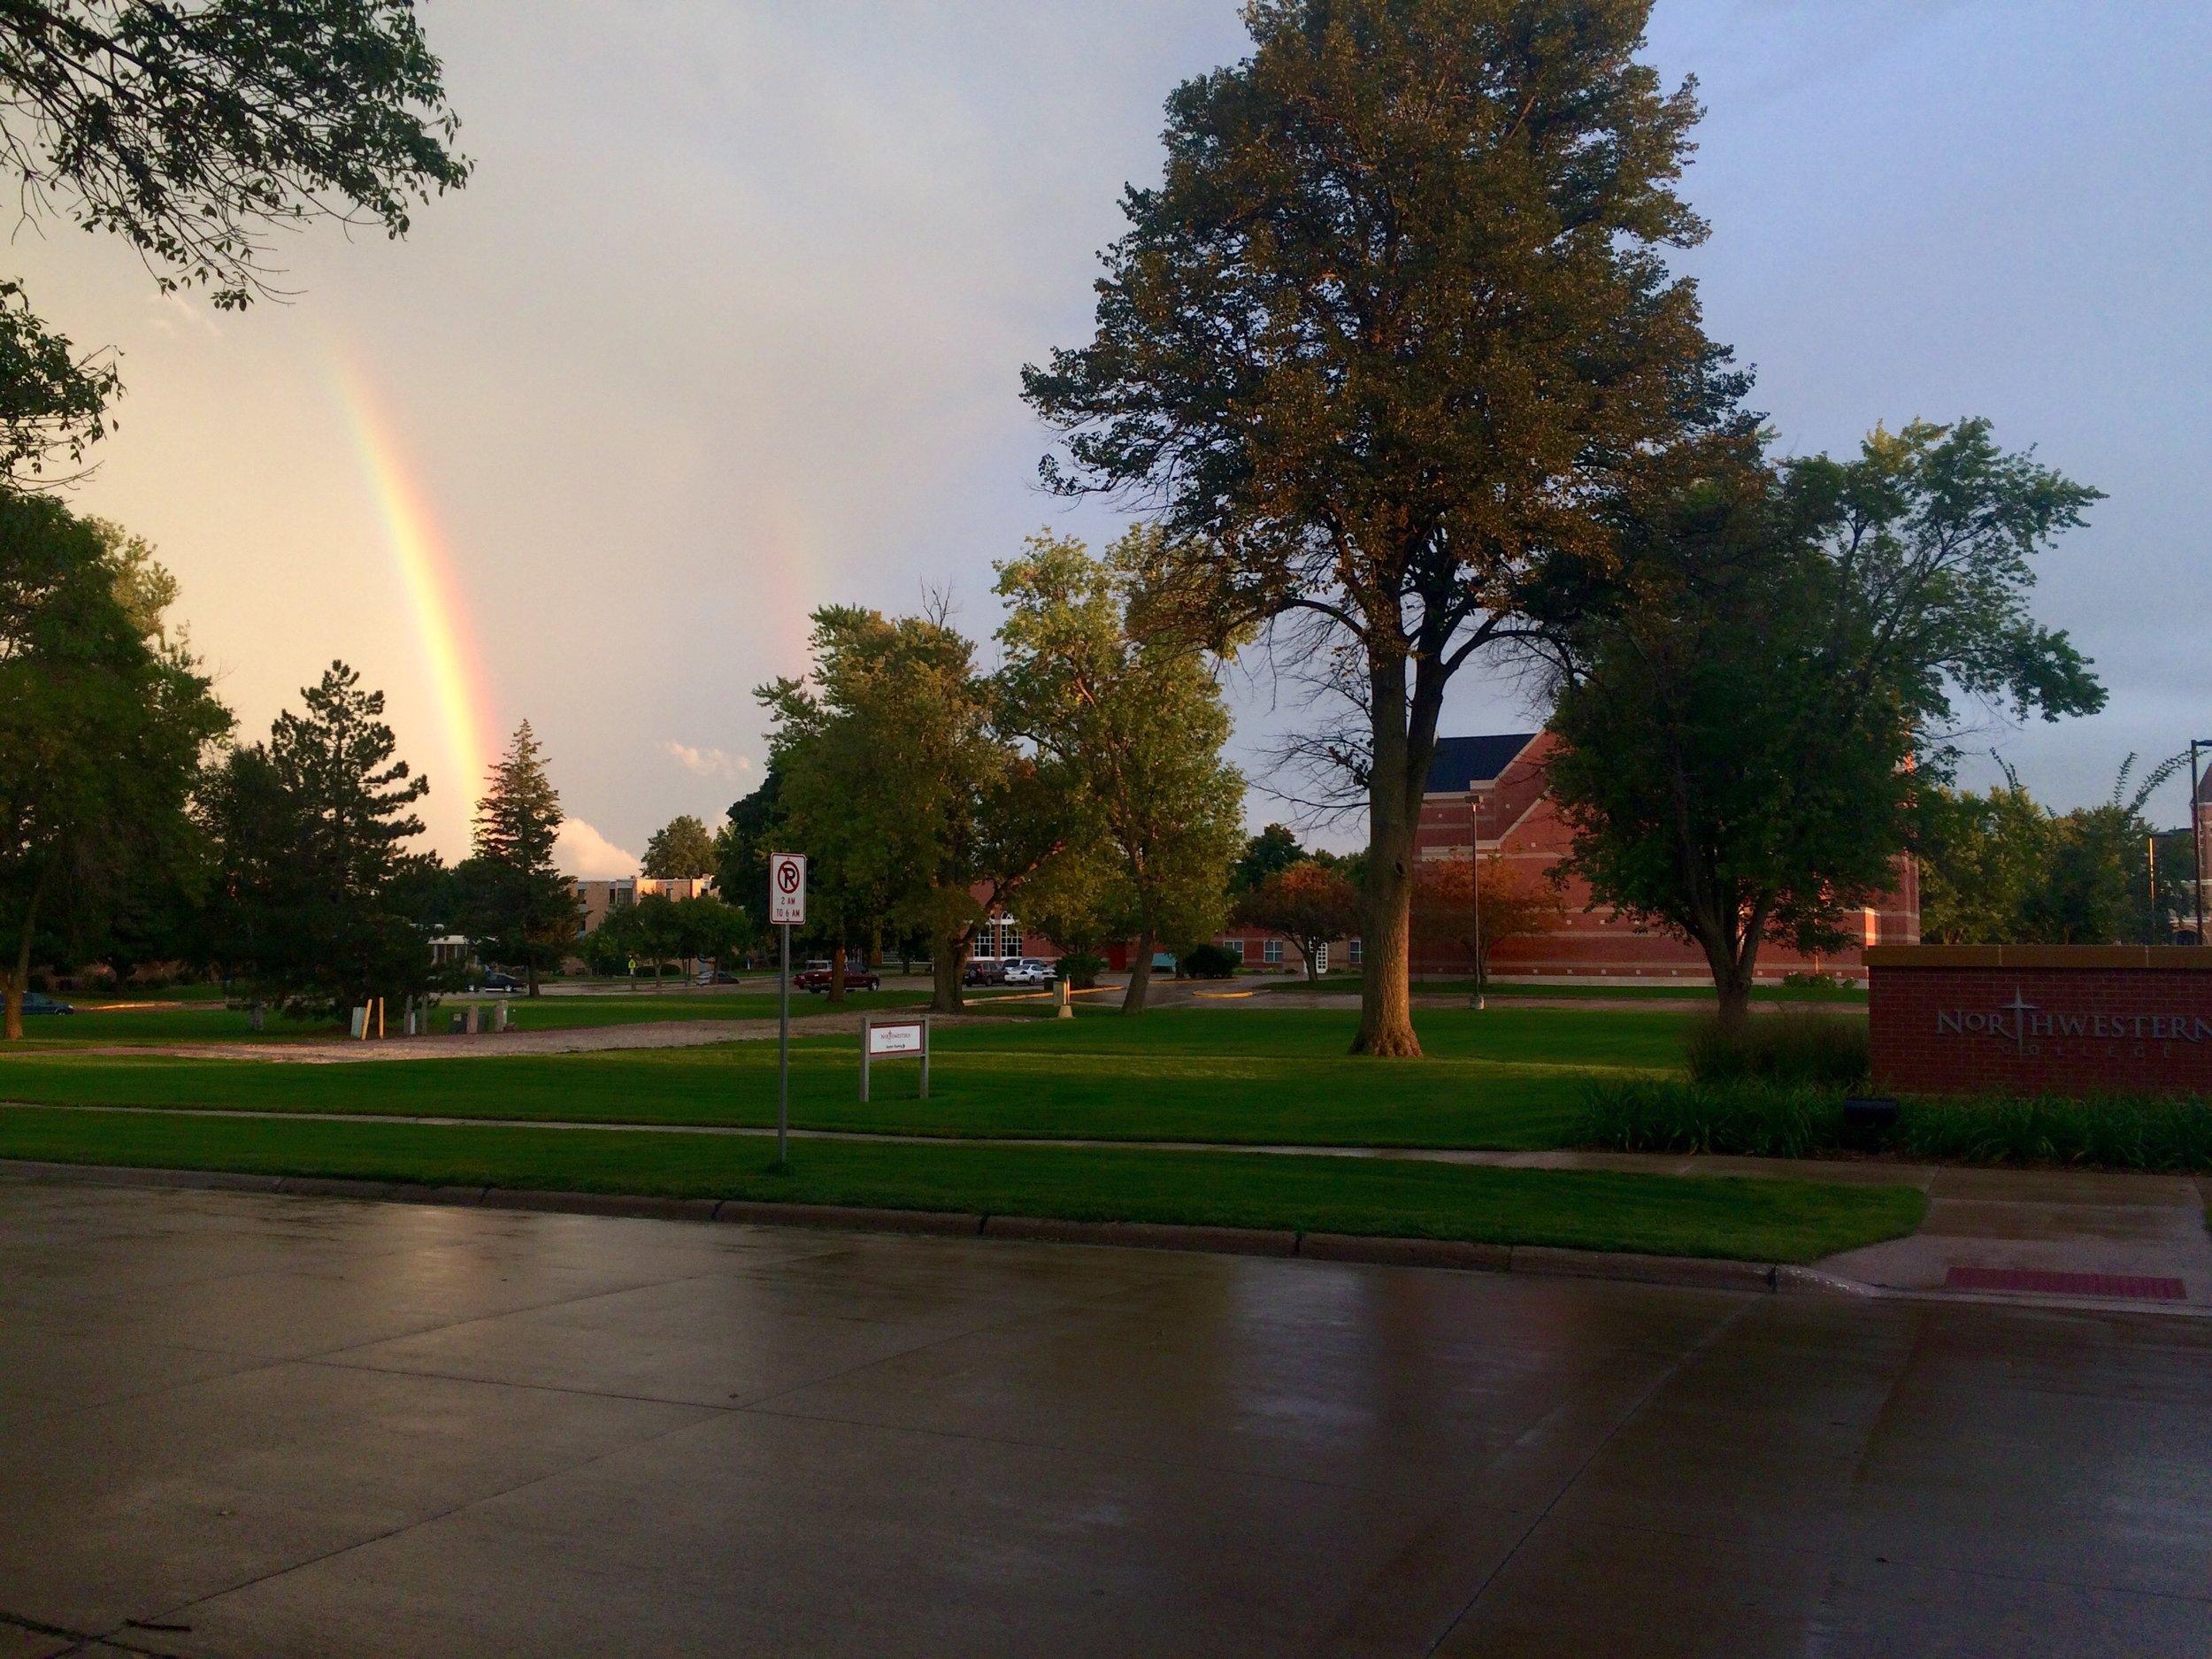 2018-05-02_Meier_campus after rain.JPG